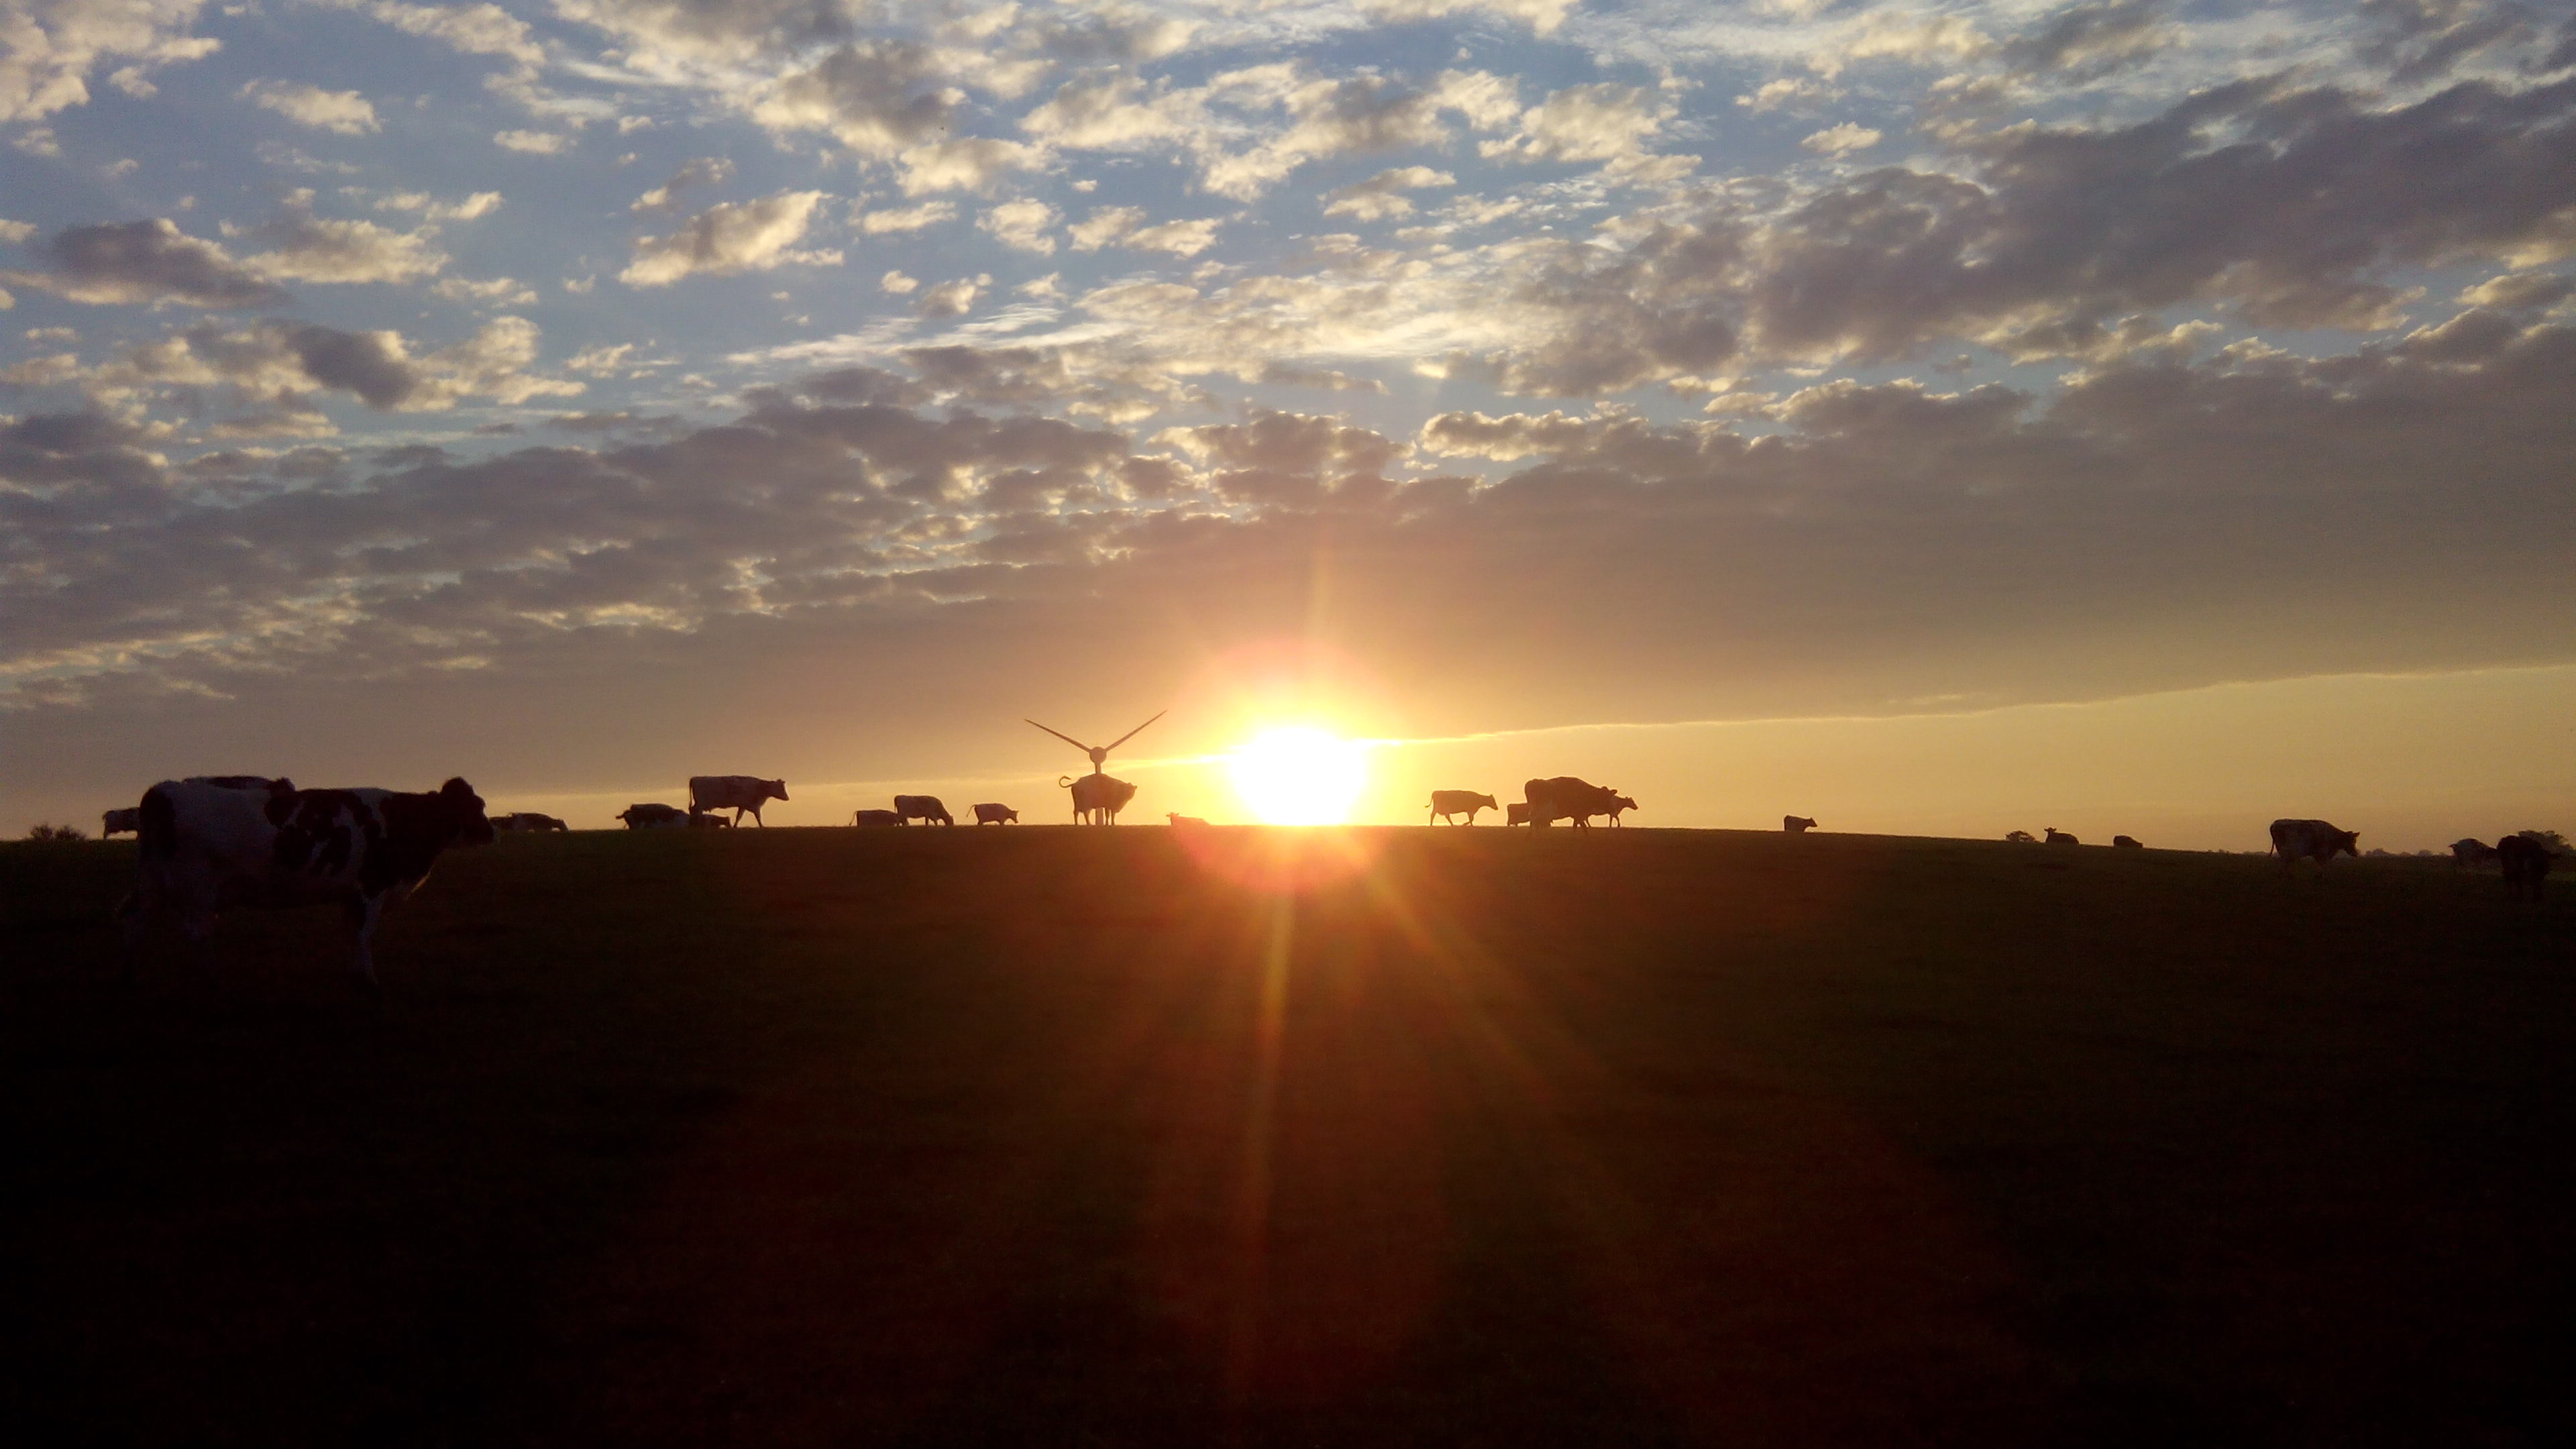 Early Morning Farm 02 by Chefalton on DeviantArt